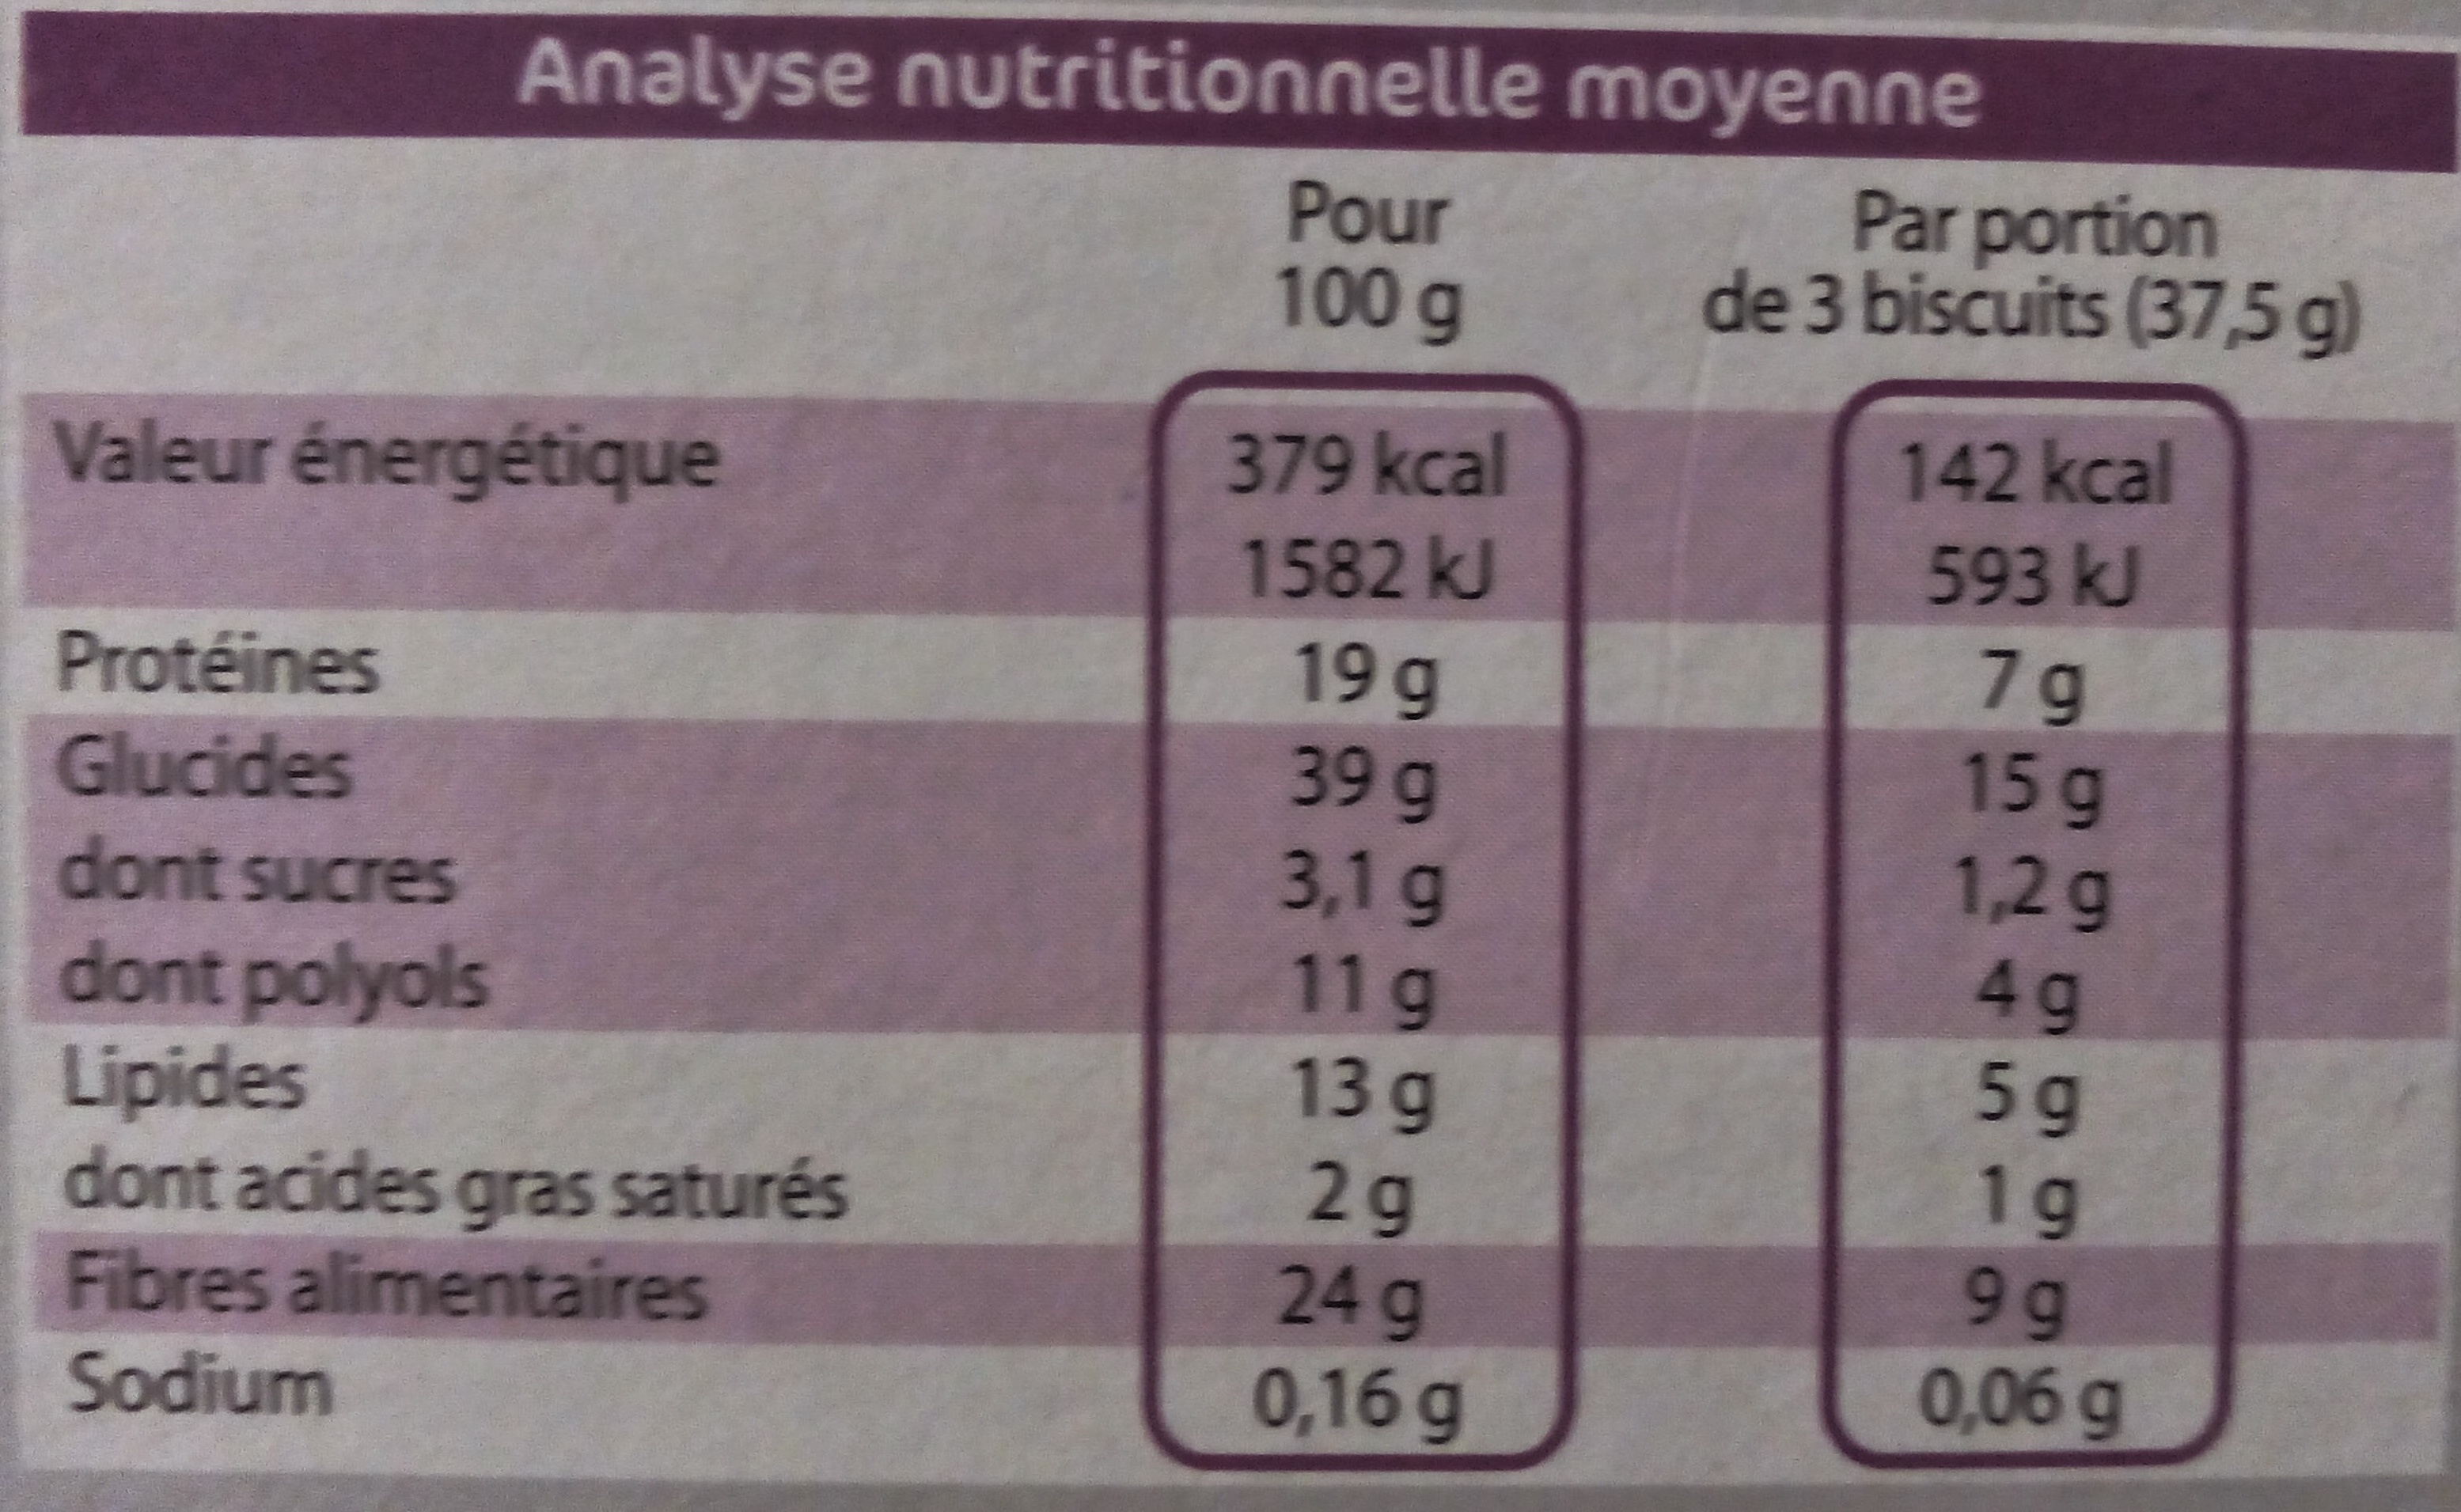 Biscuit de son d'avoine saveur miel Gayelord Hauser - Voedingswaarden - fr